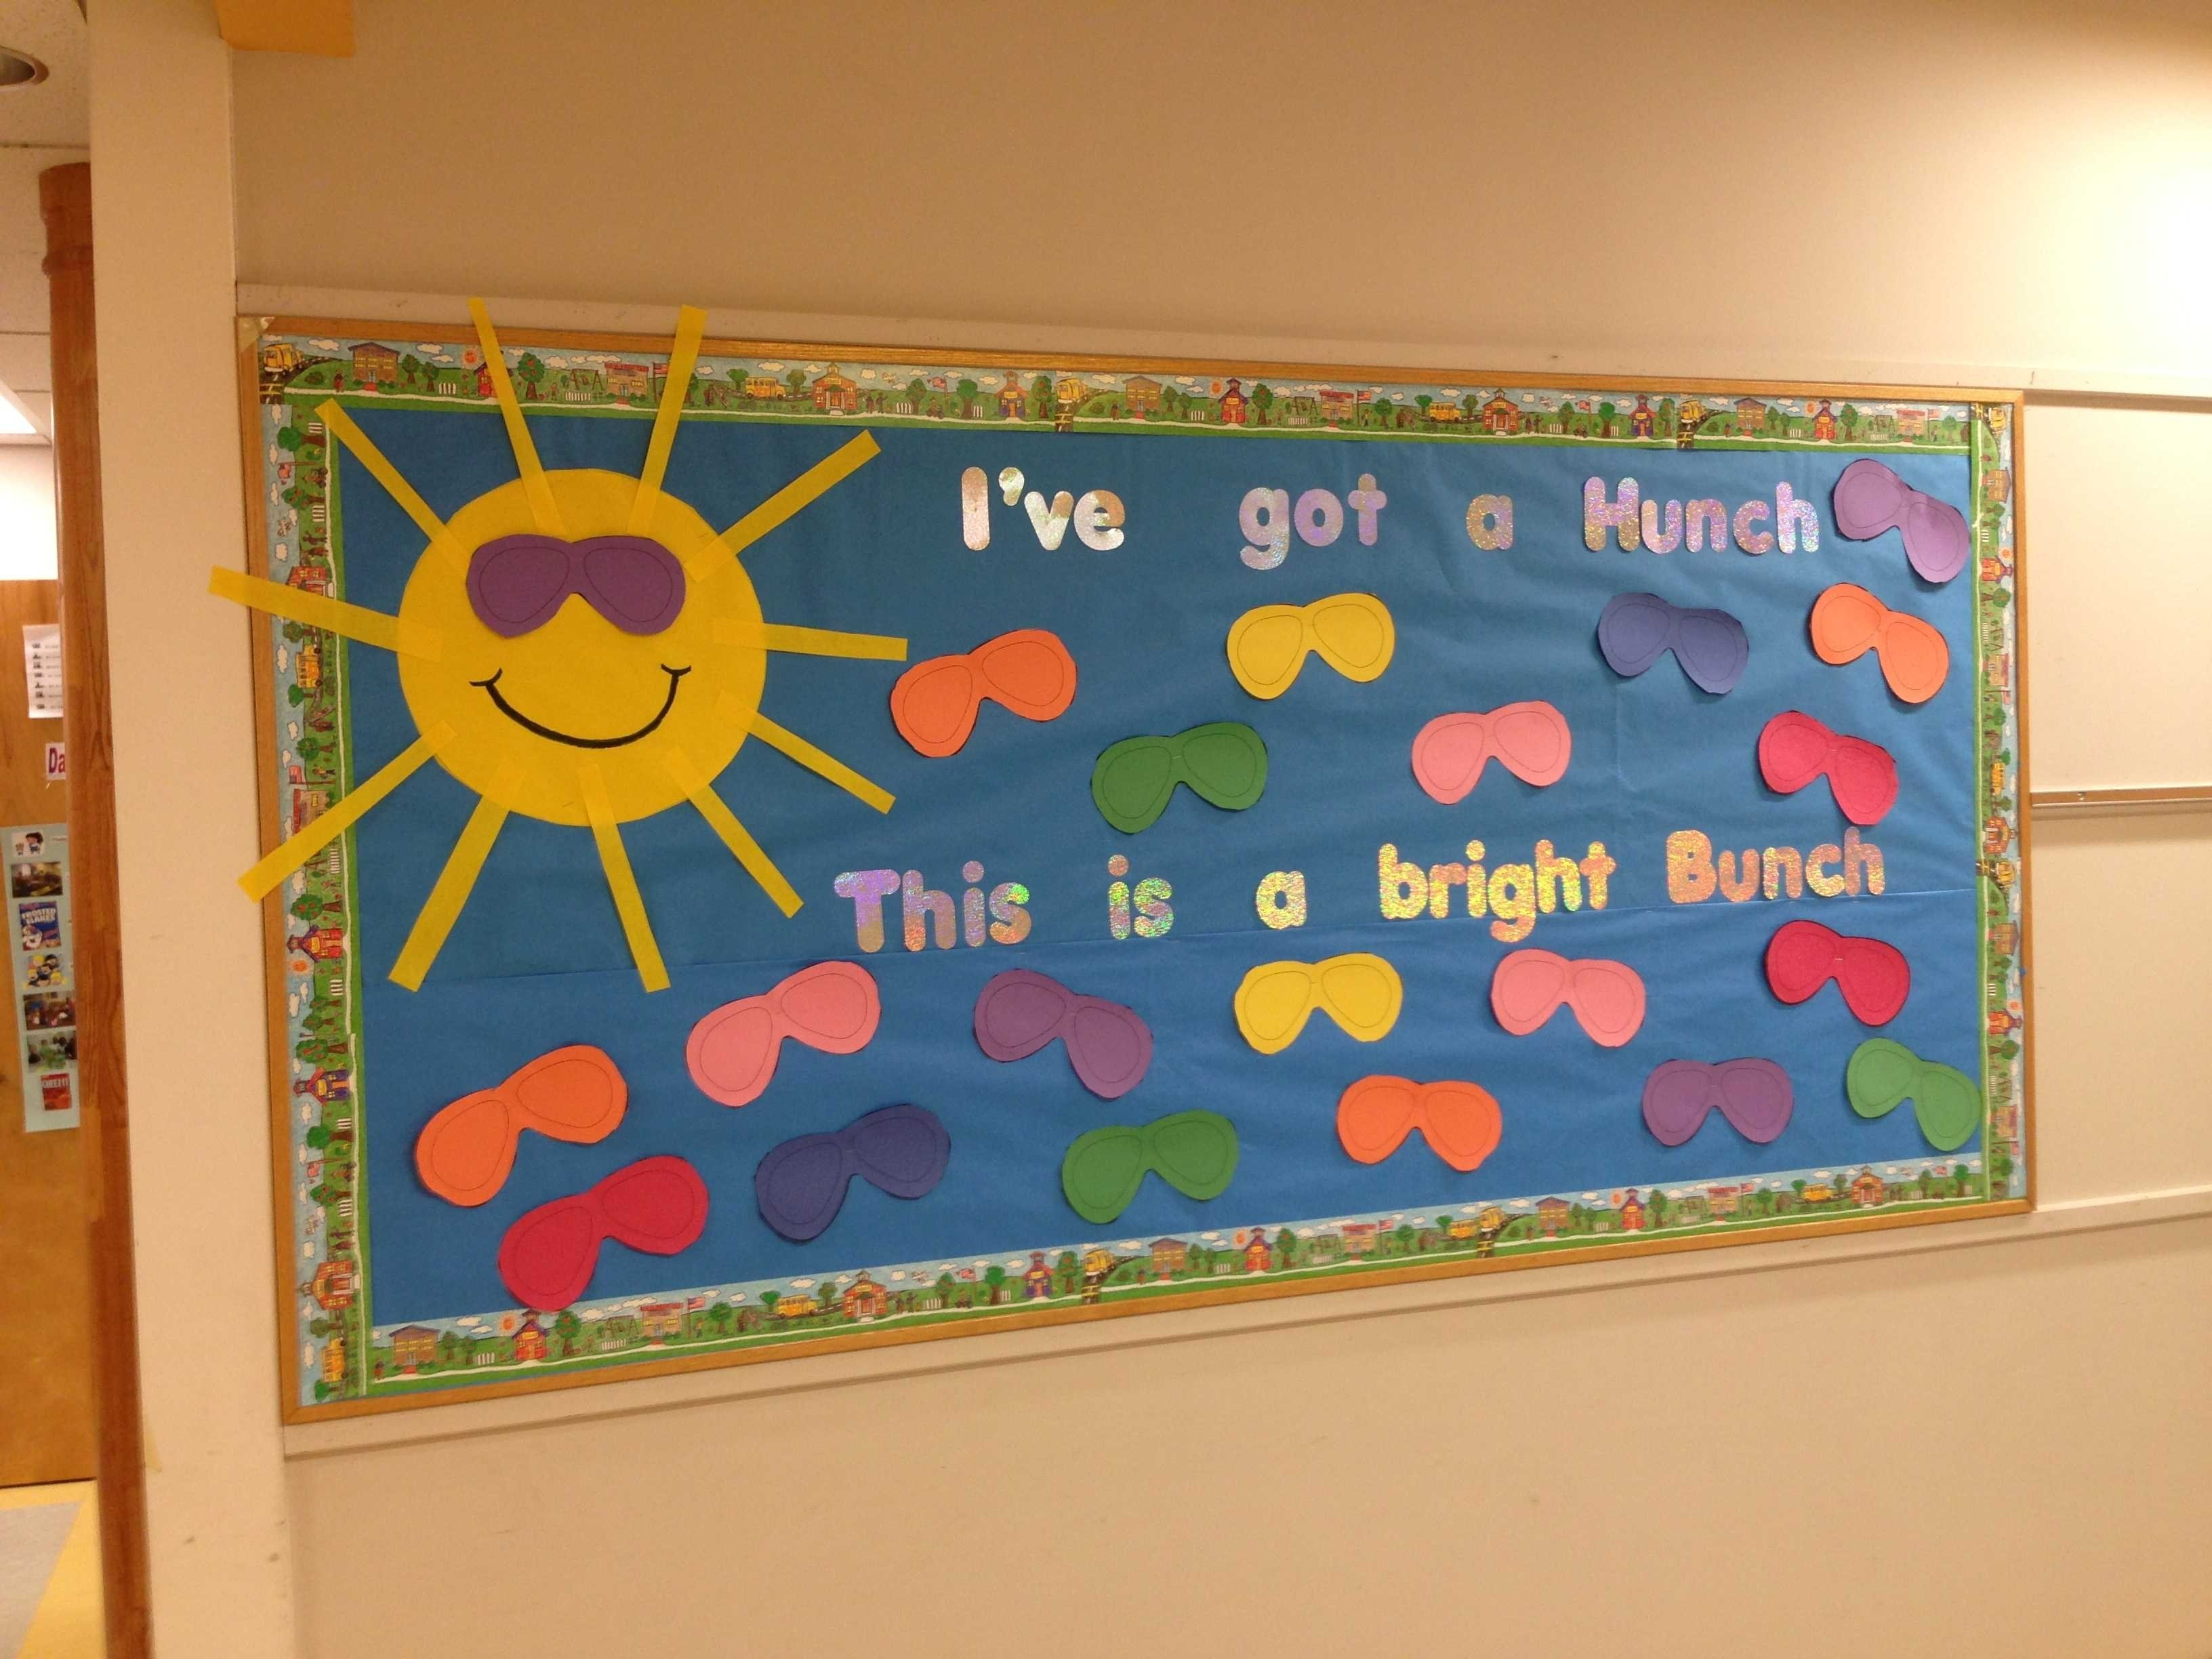 10 Stunning Bulletin Board Ideas For Summer fabulous bulletin board ideas for summer trends also teachers 2021